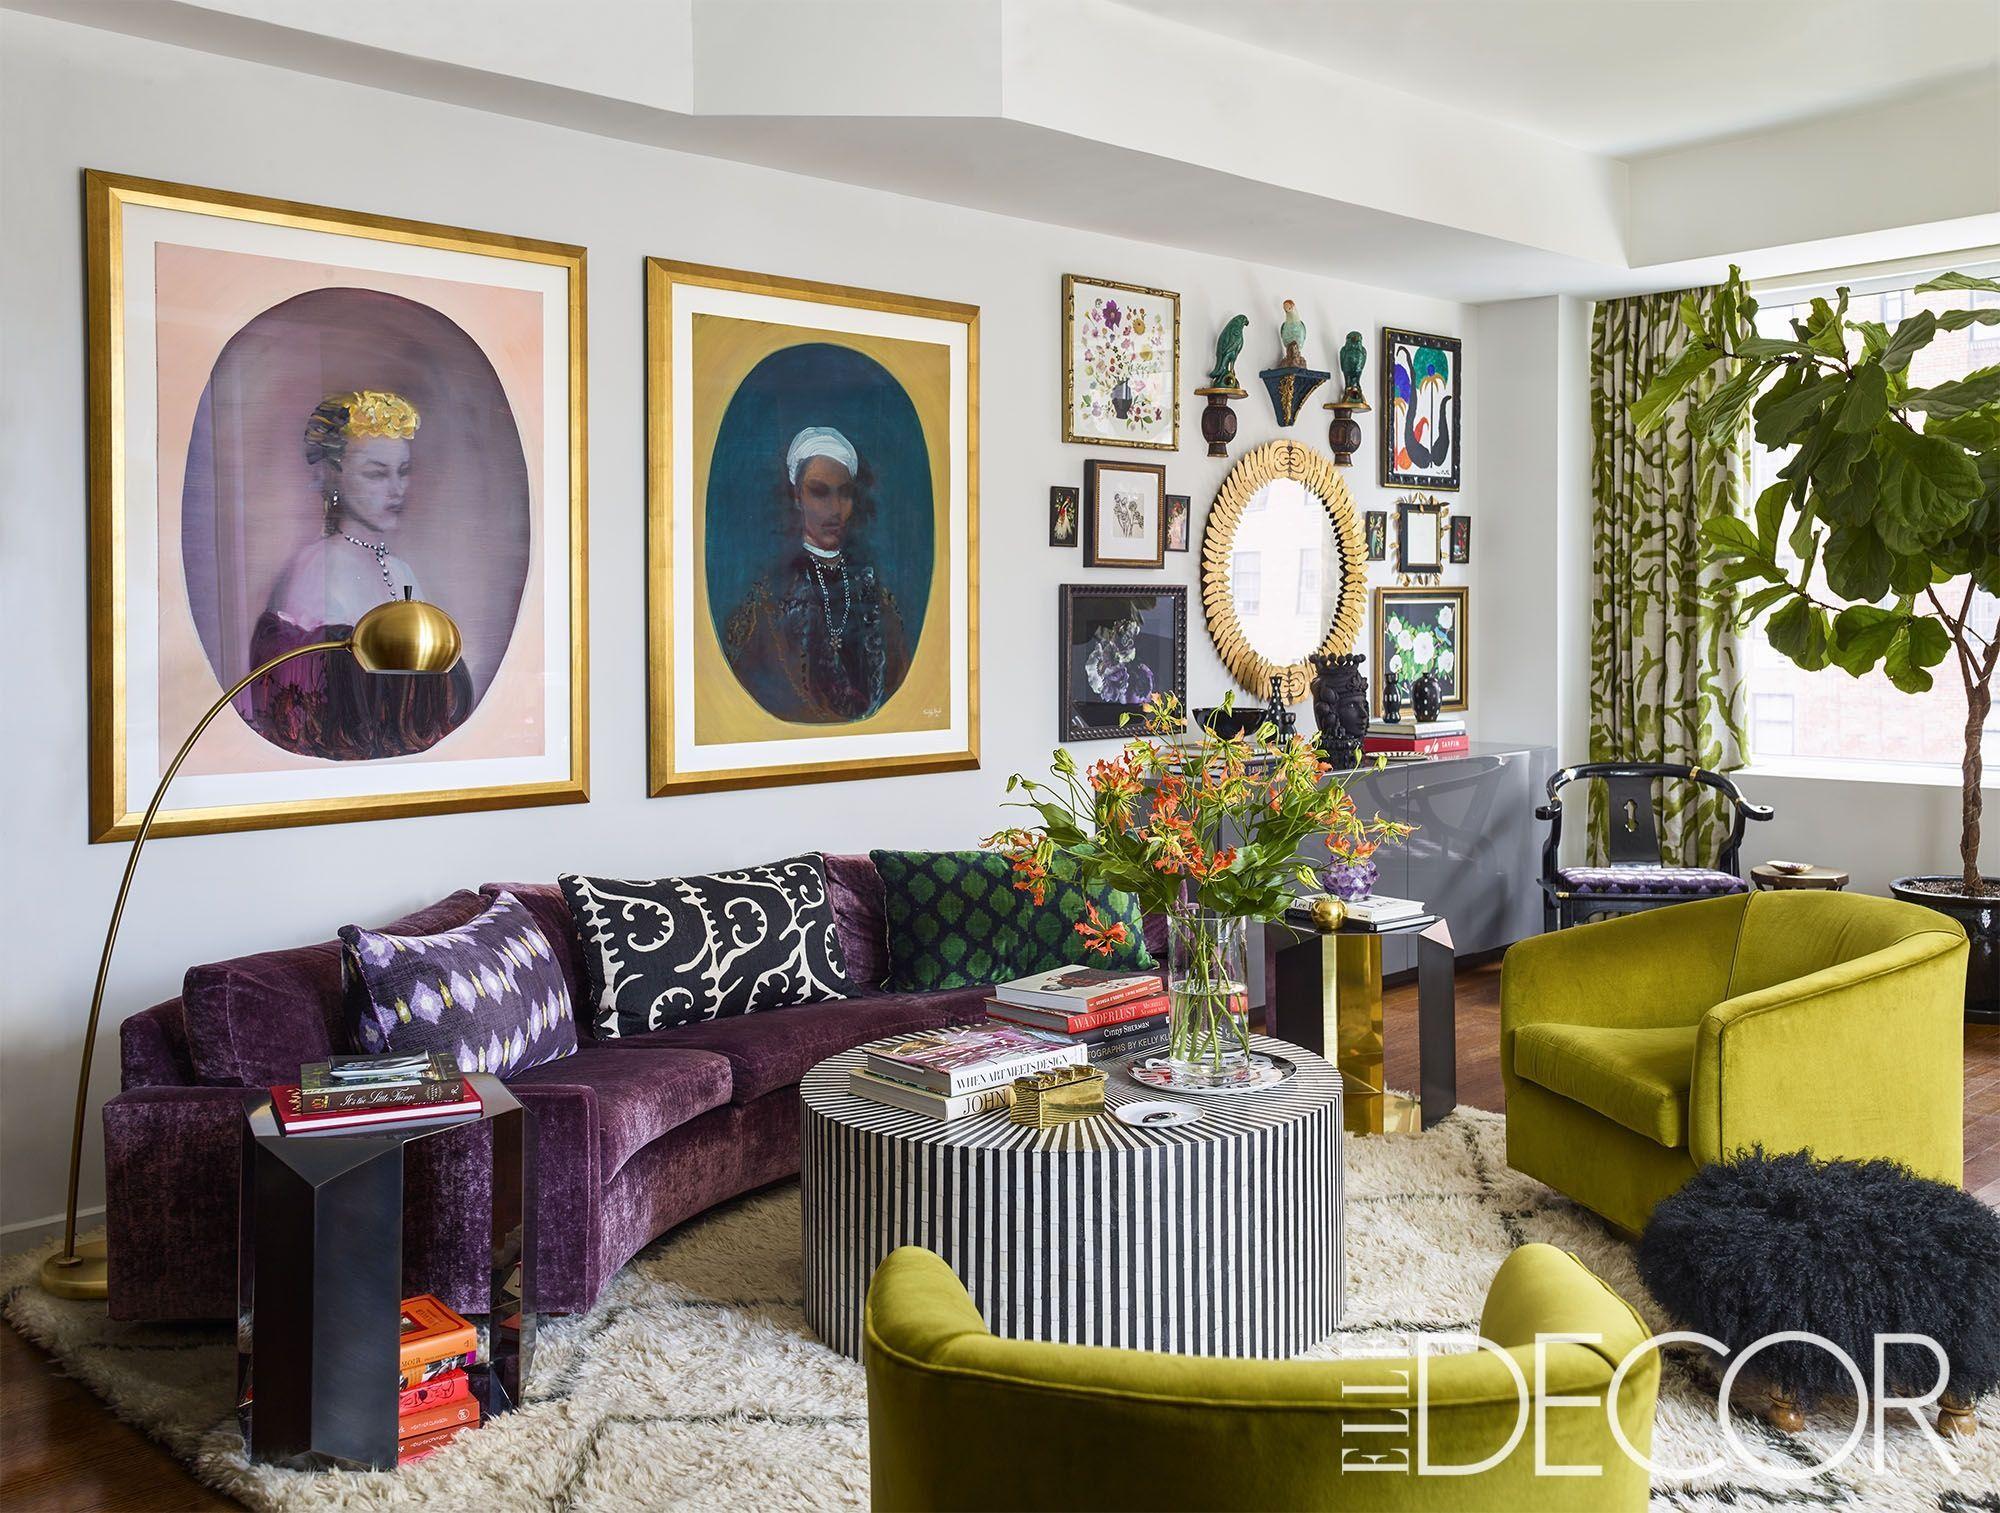 Interior Design Boutiques Best Boutiques and Design Stores